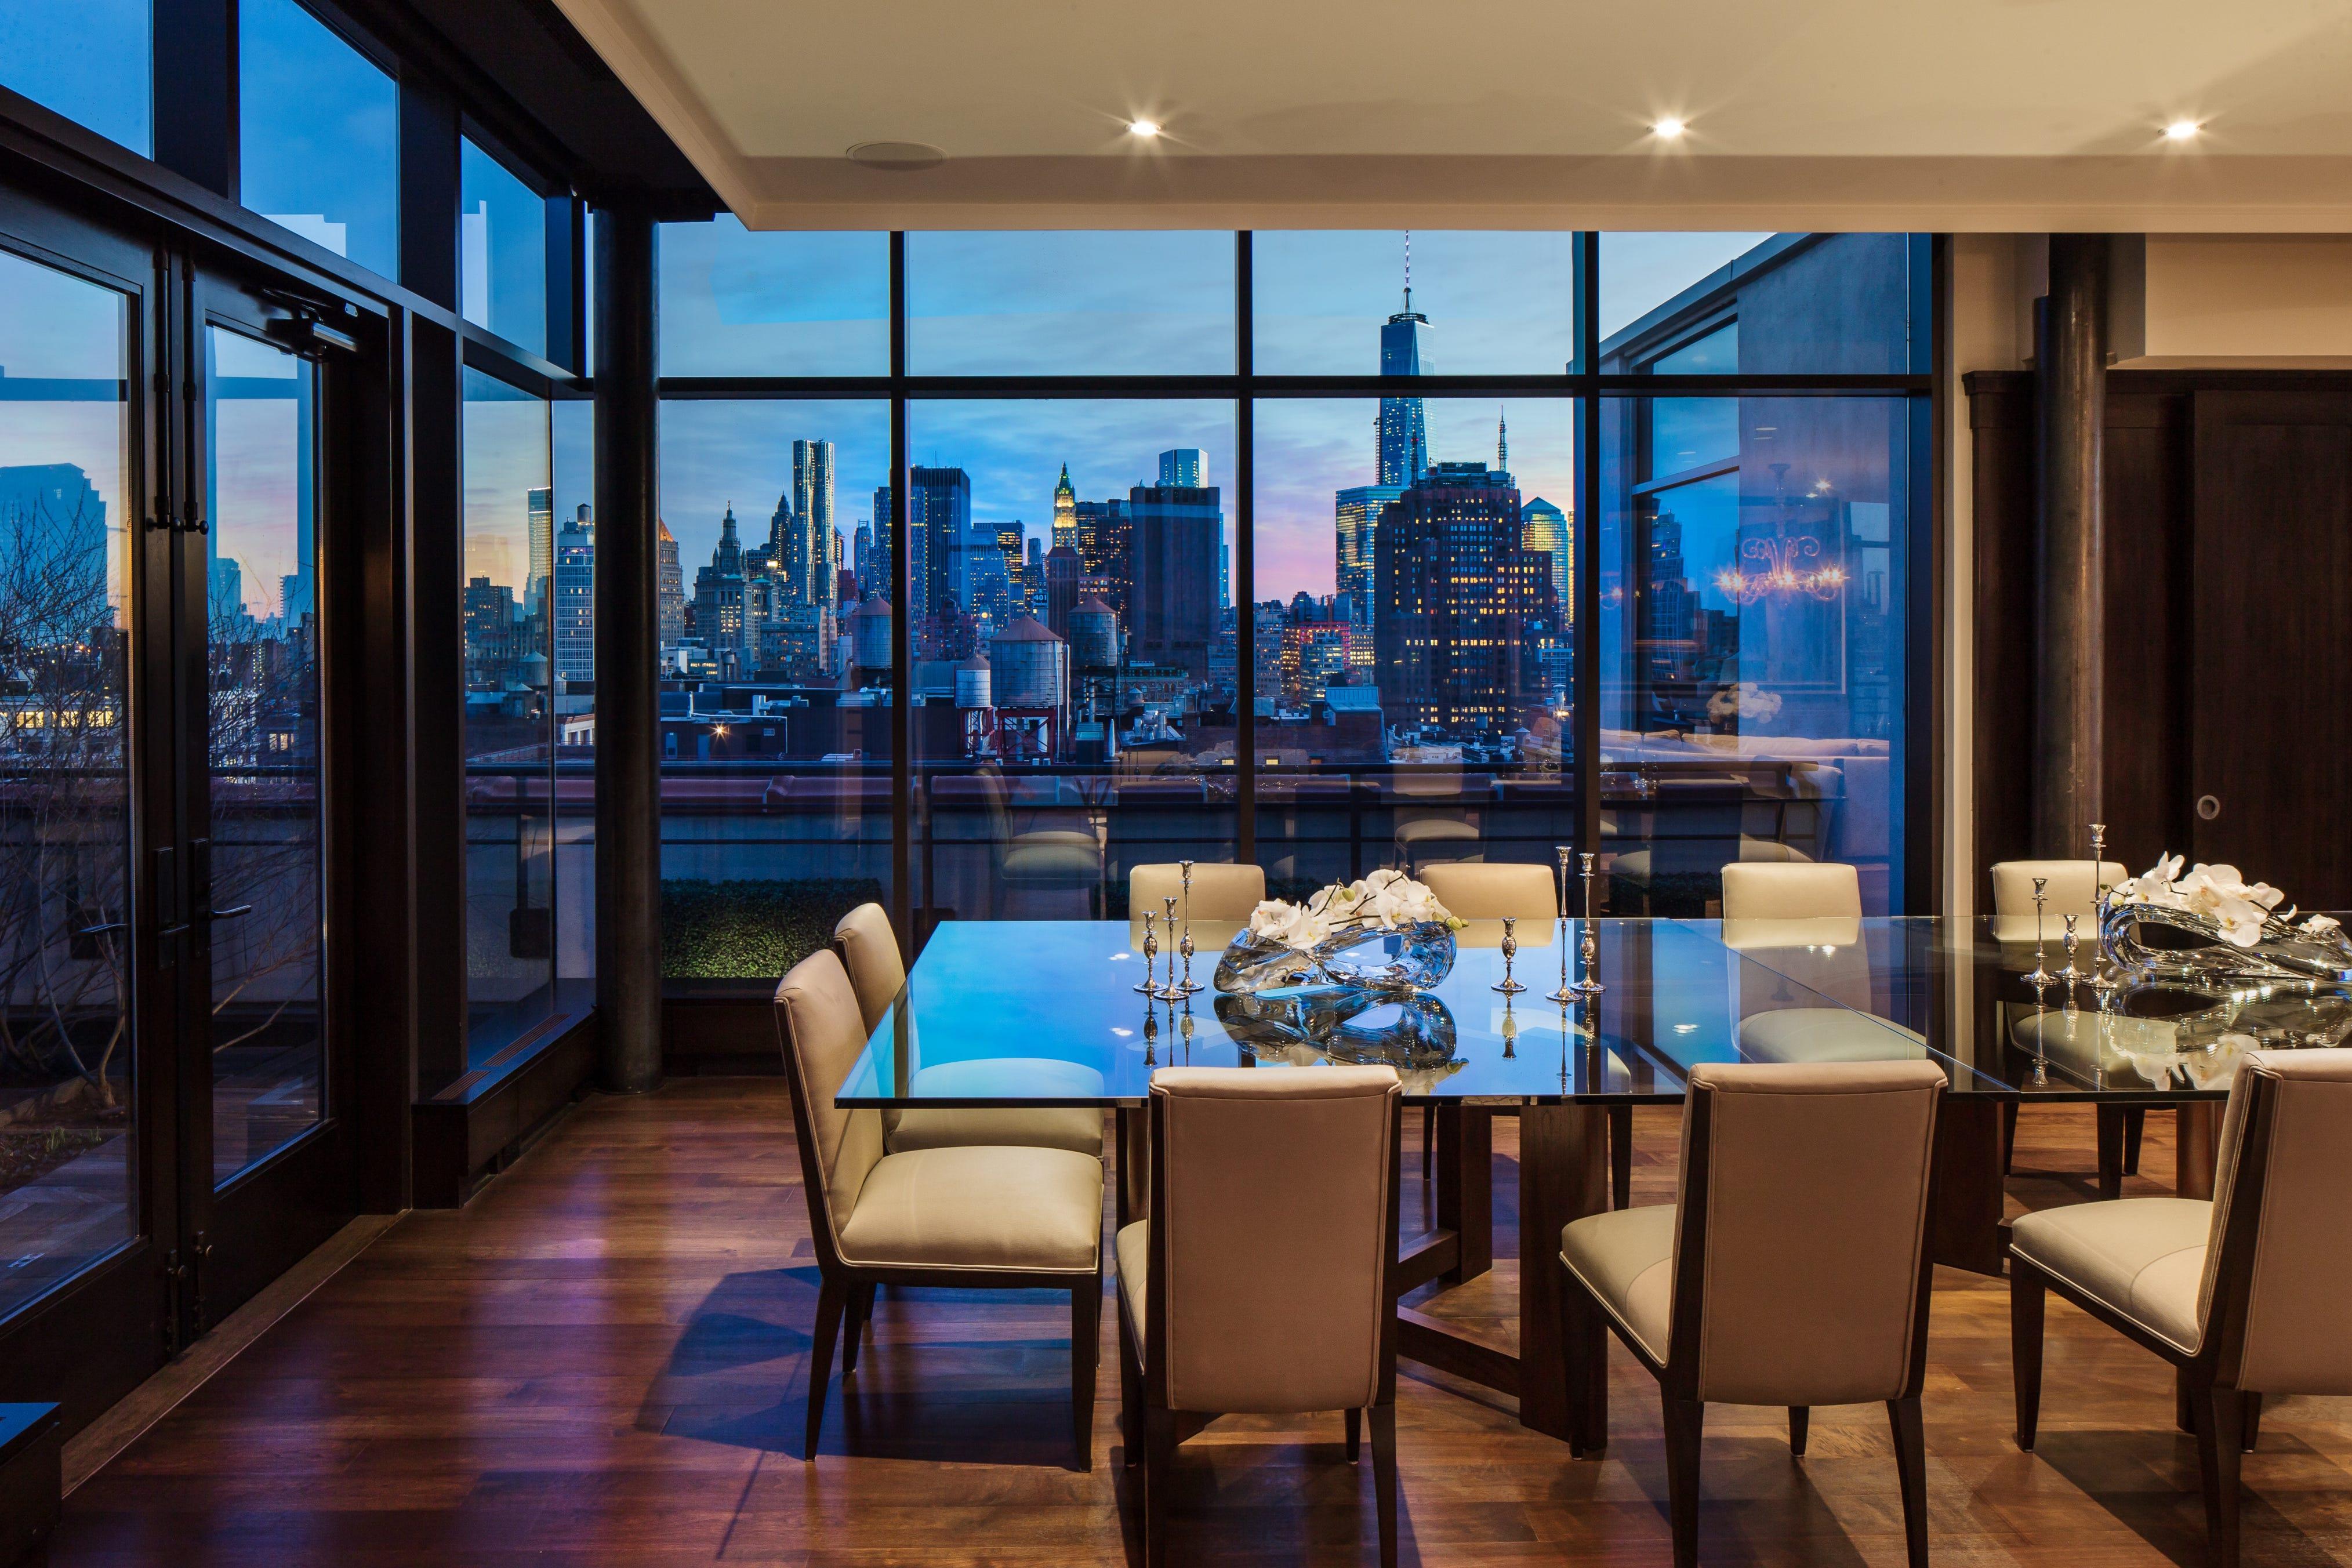 Jon Bon Joviu0027s $37.5 Million New York City Penthouse Is On The Market.  (Photo: TopTenRealEstateDeals.com)